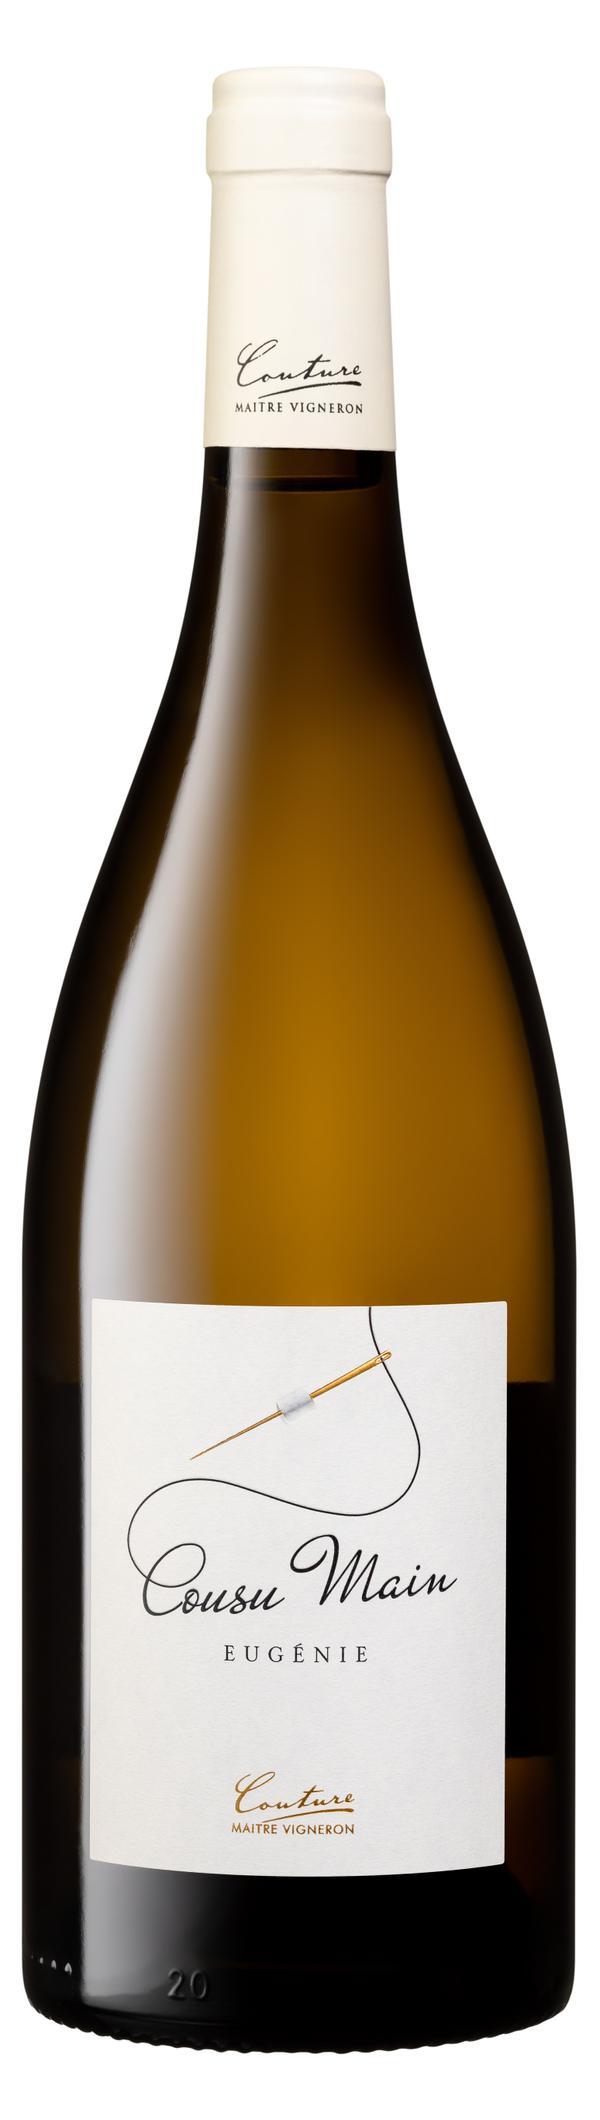 Cousu Main Eugénie, I.G.P. Côtes du Lot, Blanc sec